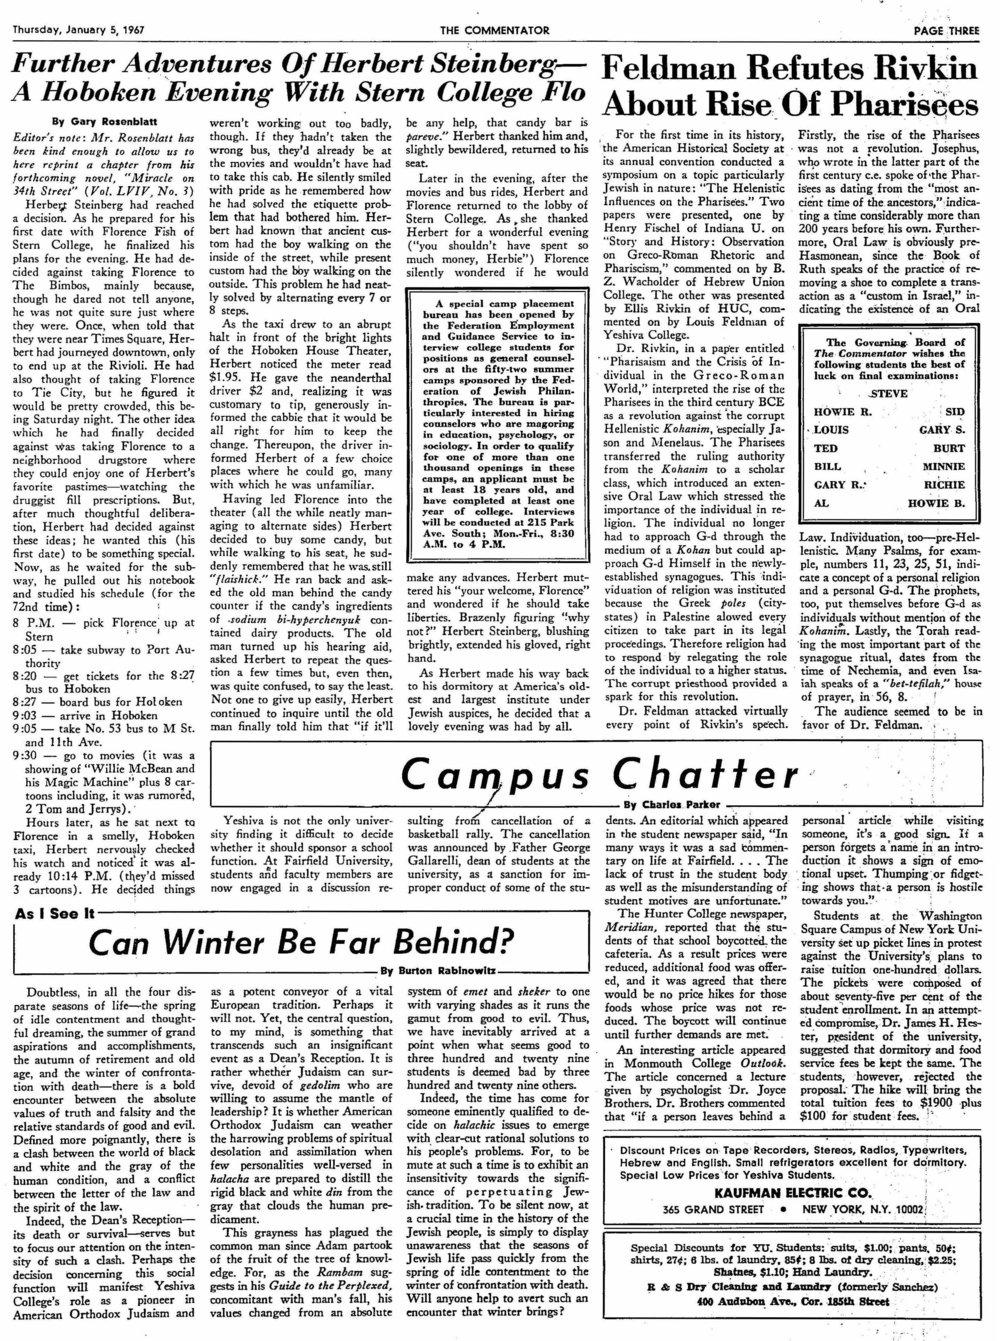 1967.1.5.TC--Feldman Refutes Rivkin About Rise of Pharisees.jpg